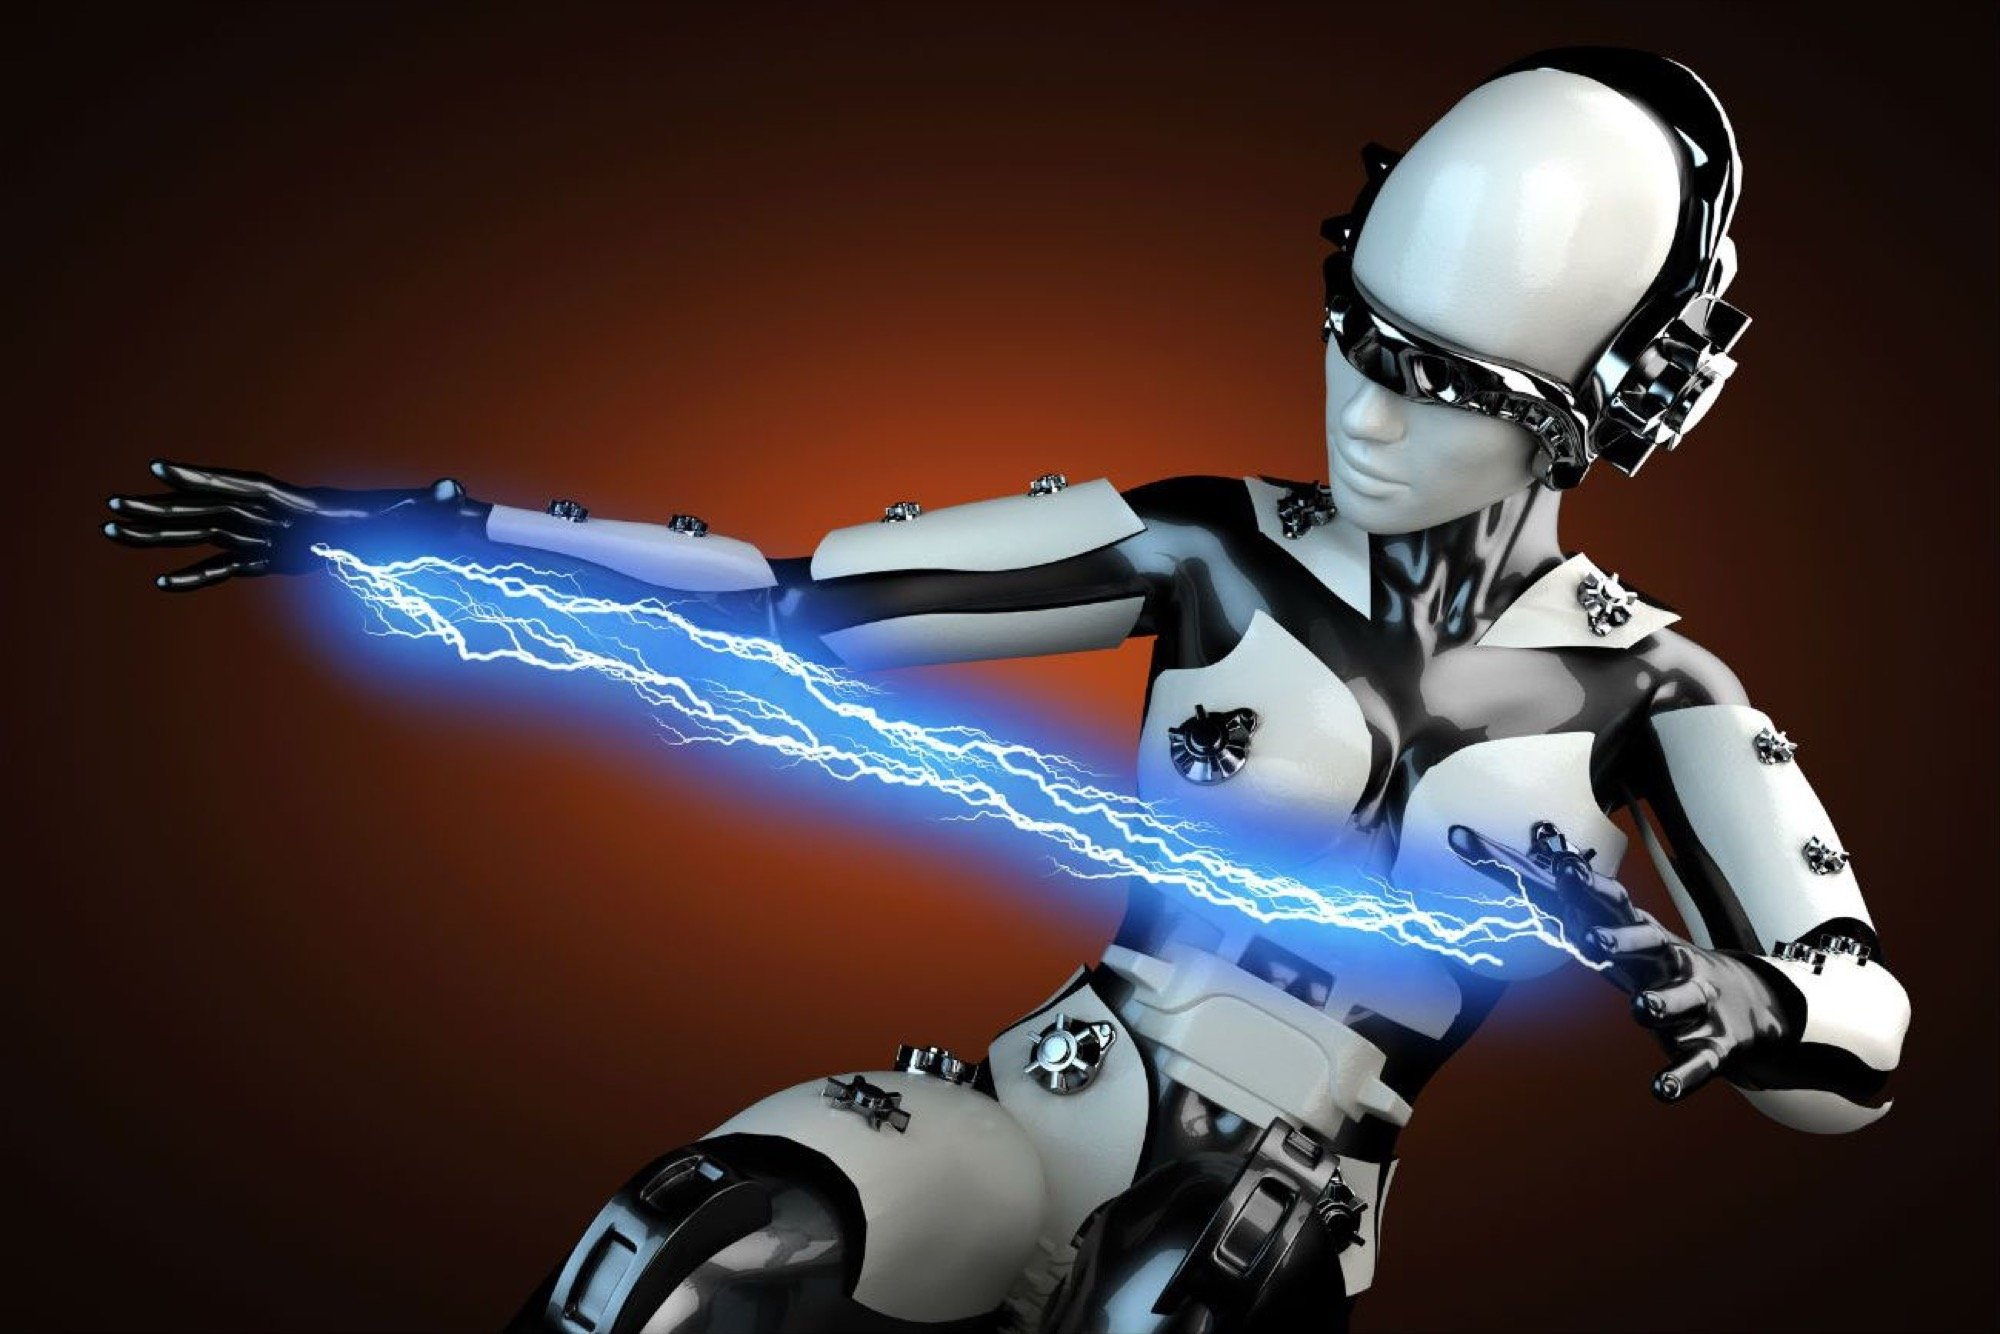 ahorro energético, big data, DeepMind, Google, Indoorclima, inteligencia artifical, optimizacion energetica, SGClima